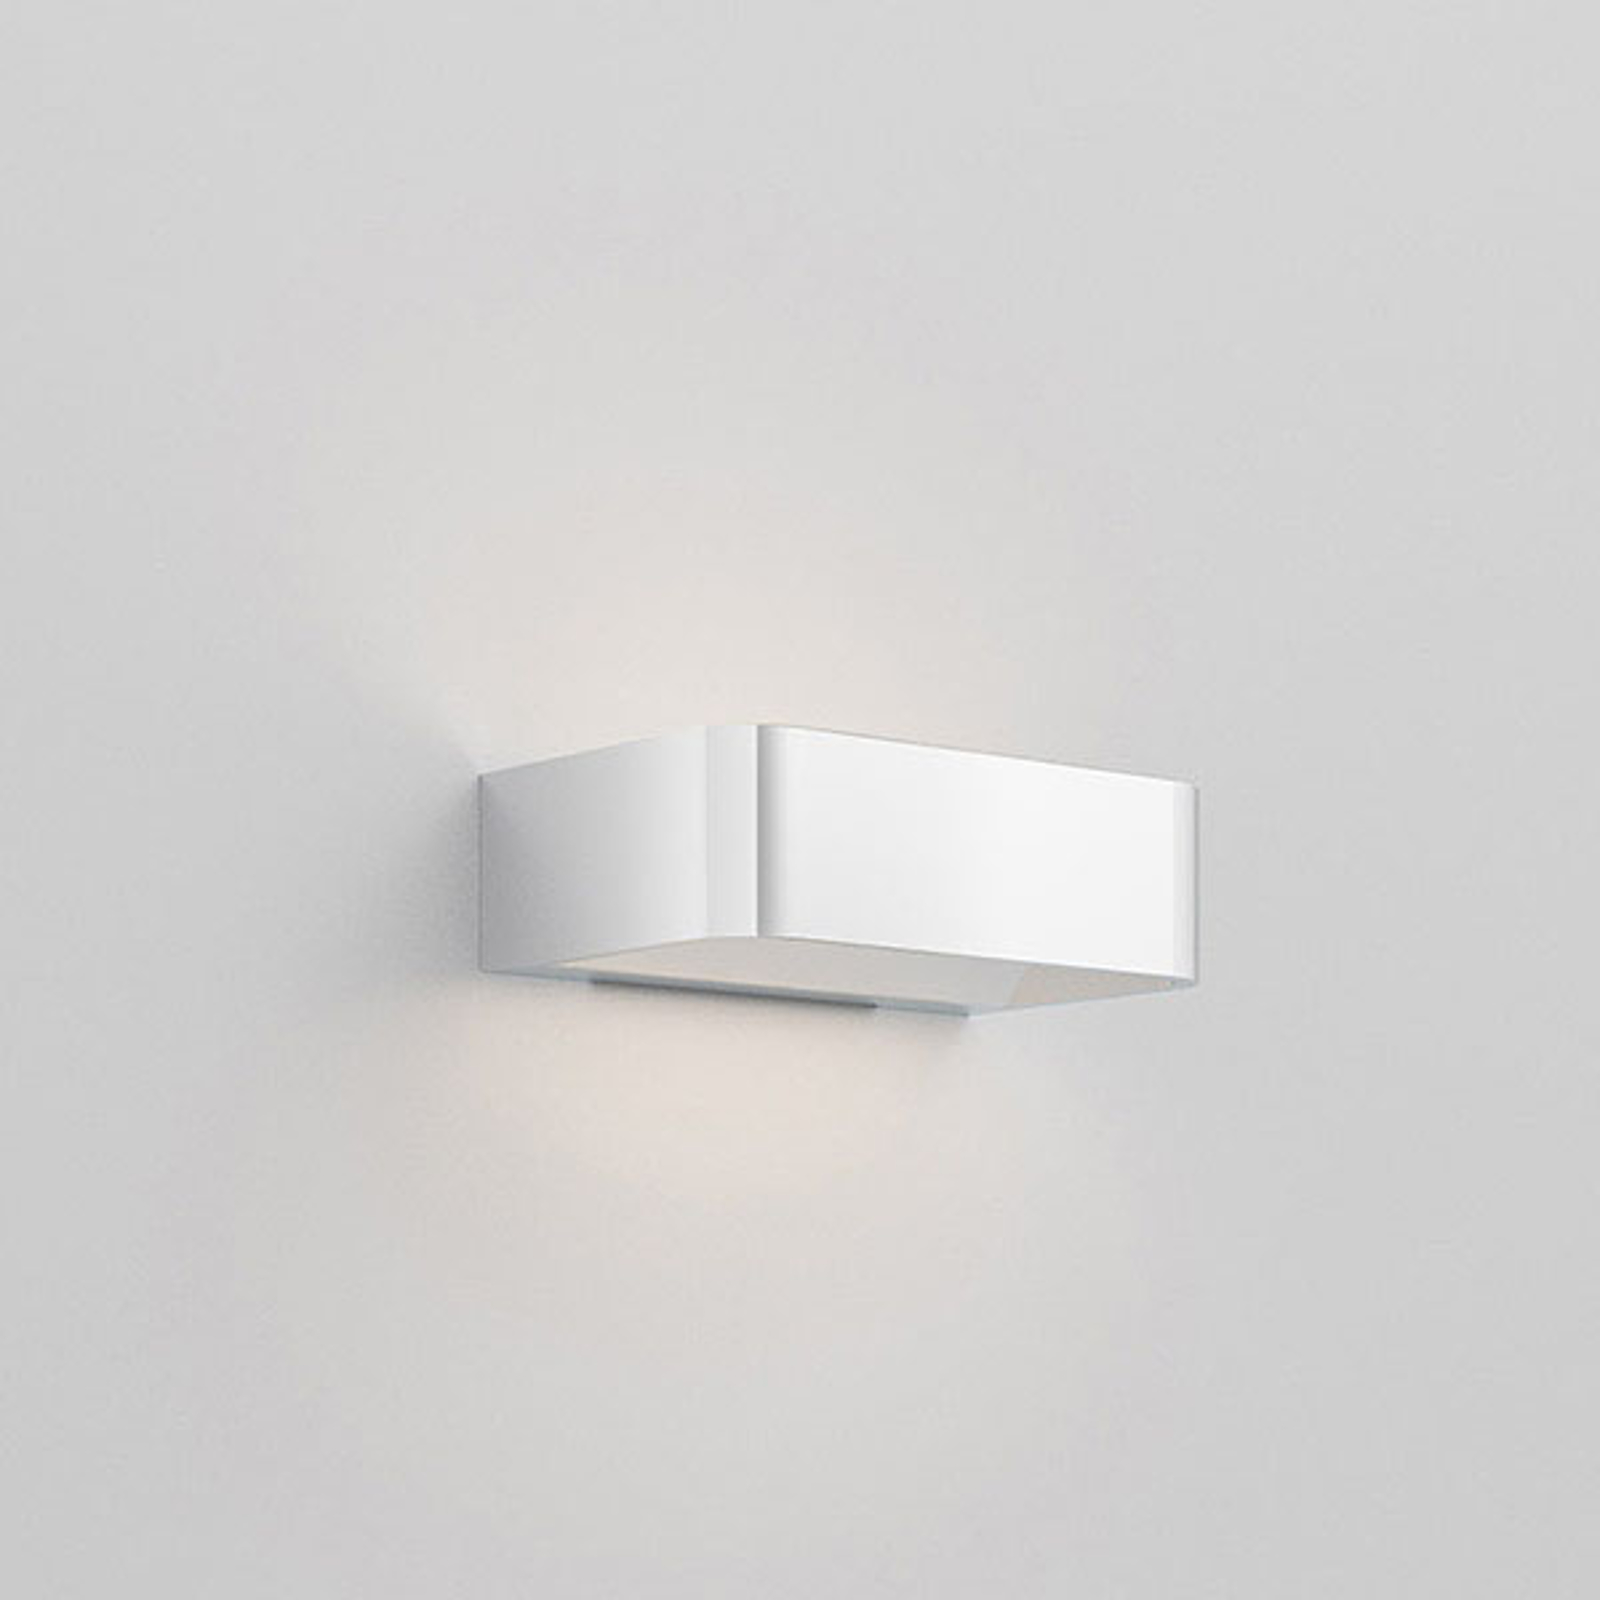 Rotaliana Frame W1 LED-vegglampe krom 2700K